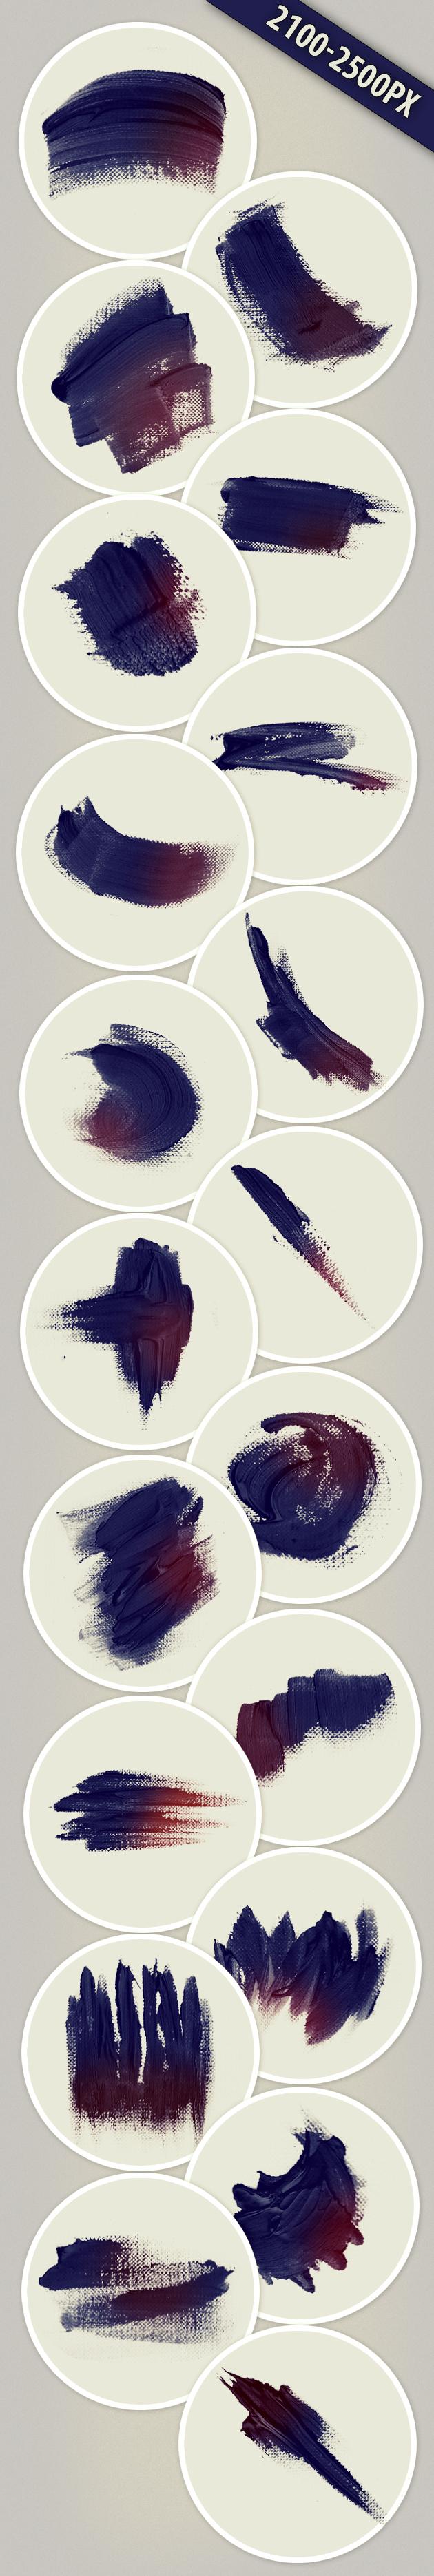 Paint-Strokes-PS-Brushes designtnt brushes paintstrokes large